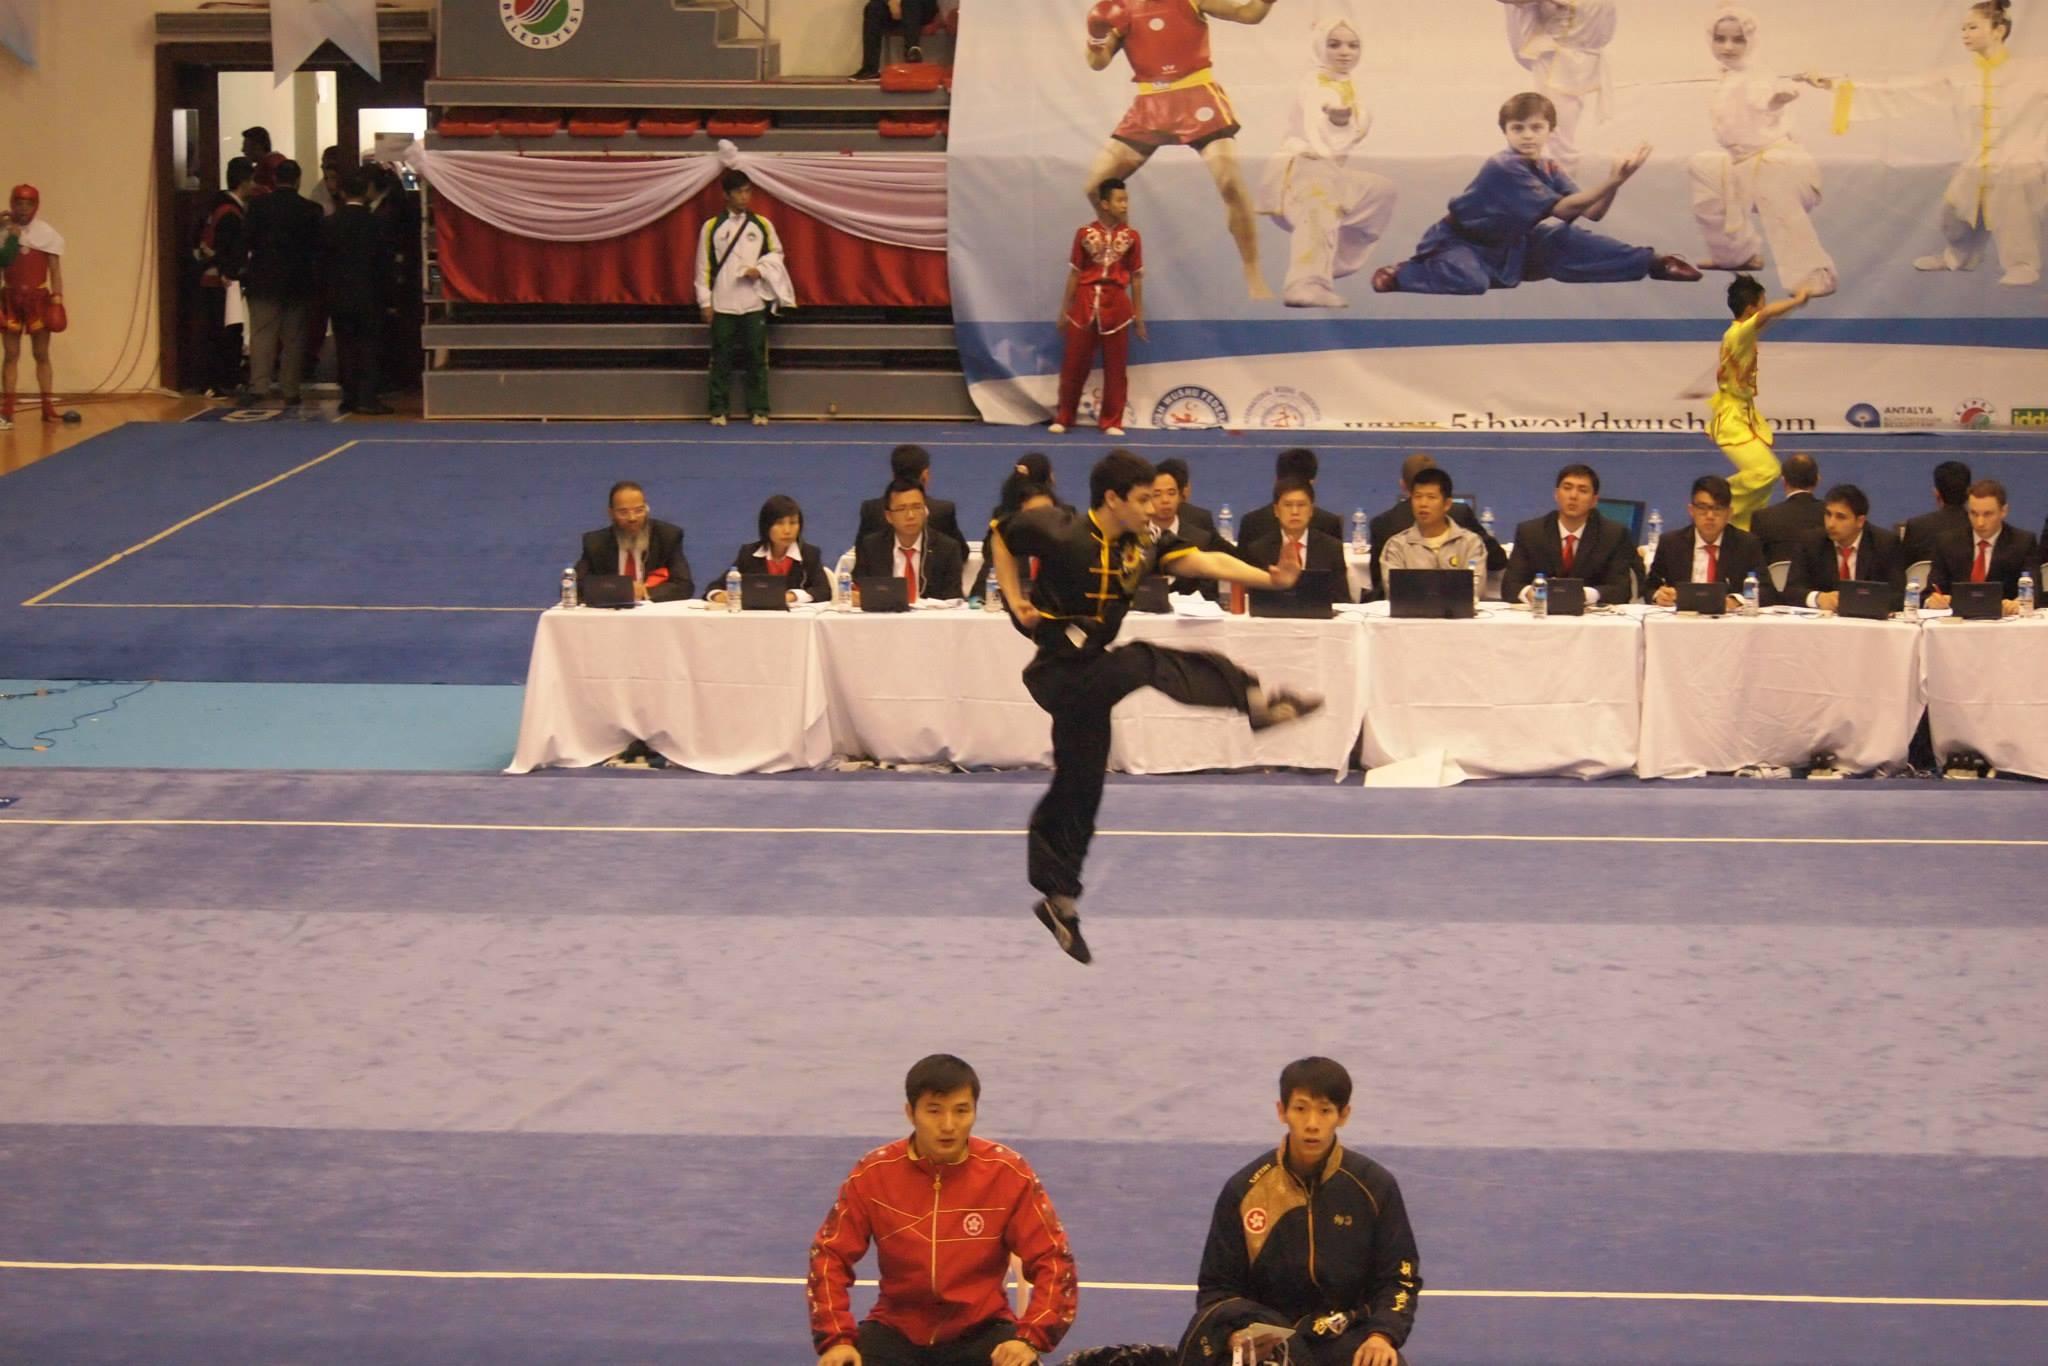 Wayland_Li_Wushu_World_Junior_Championships_2014_Team_Canada_in_Turkey_Nima_4.jpg